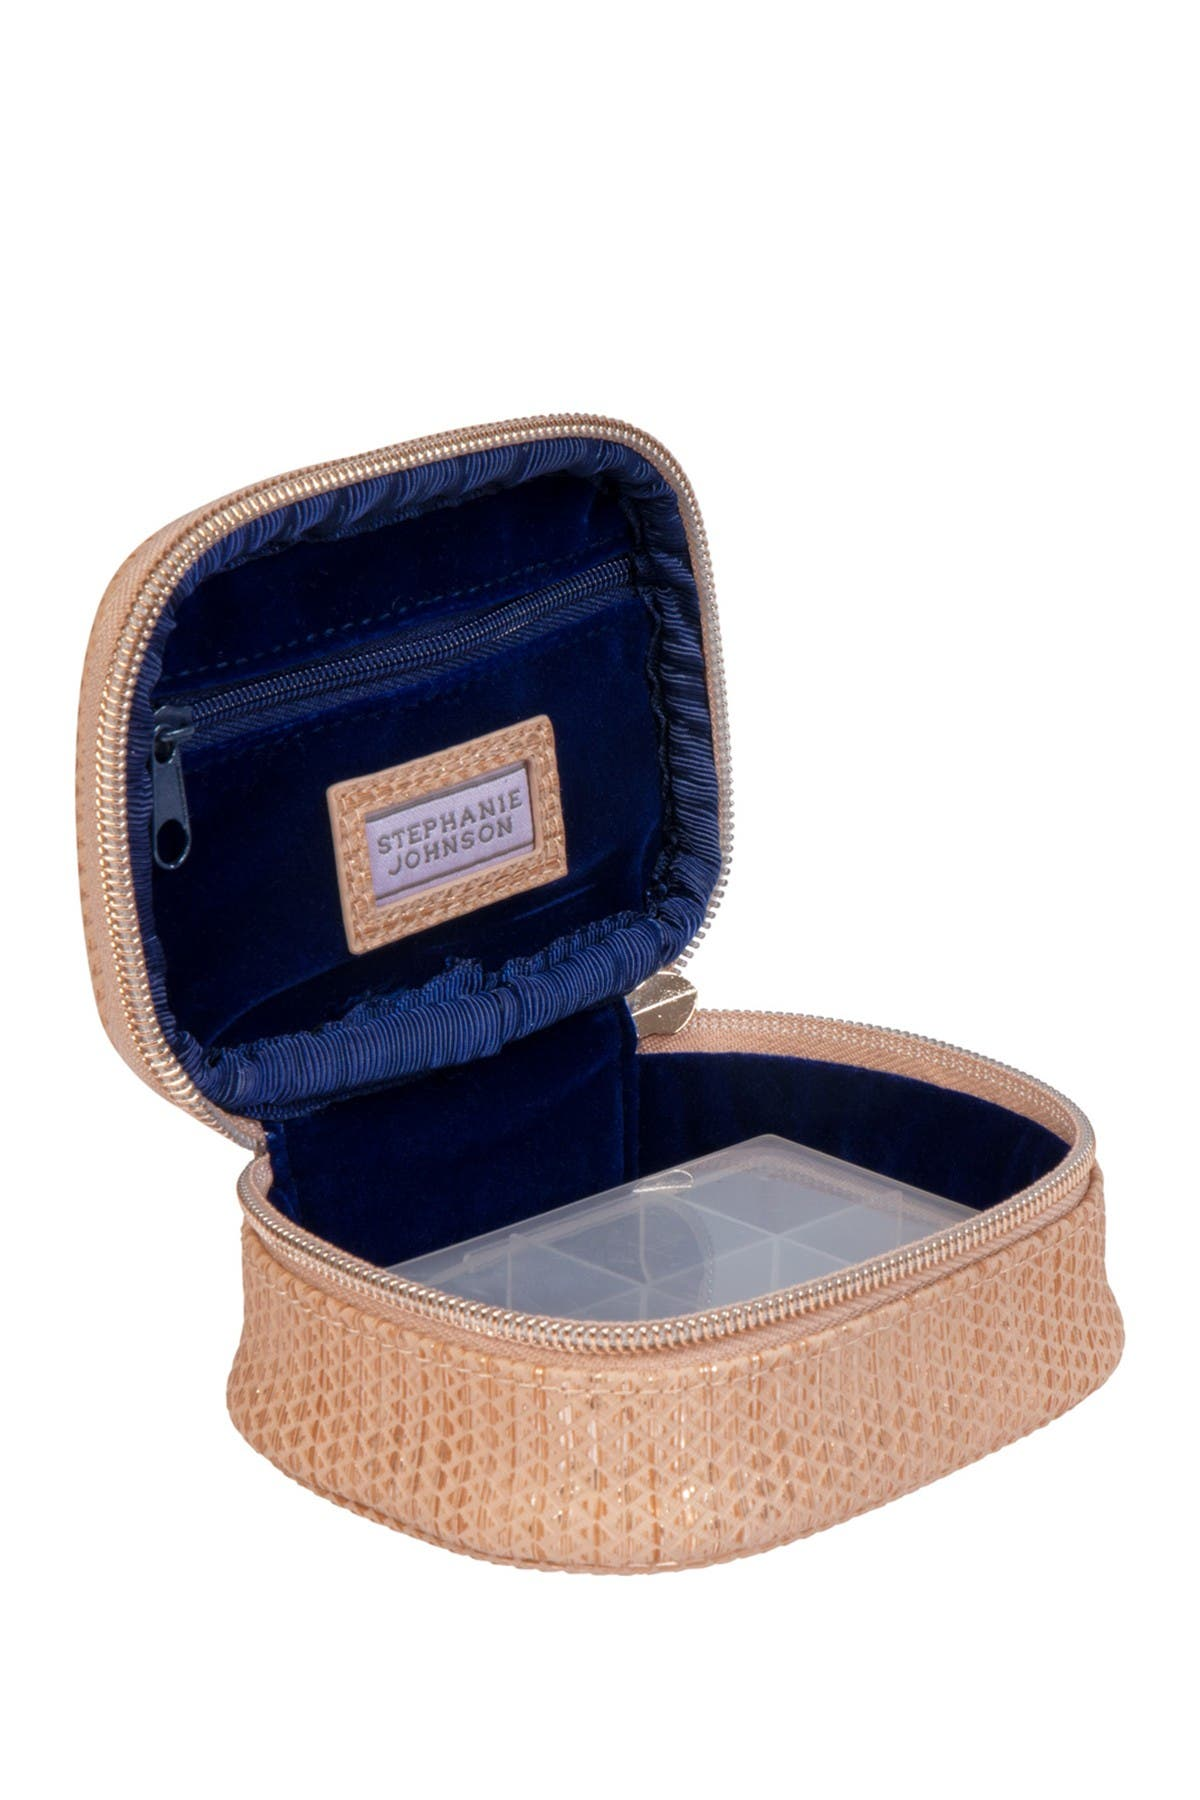 Stephanie Johnson Aruba Steph Tiny Treasure Case - Sand